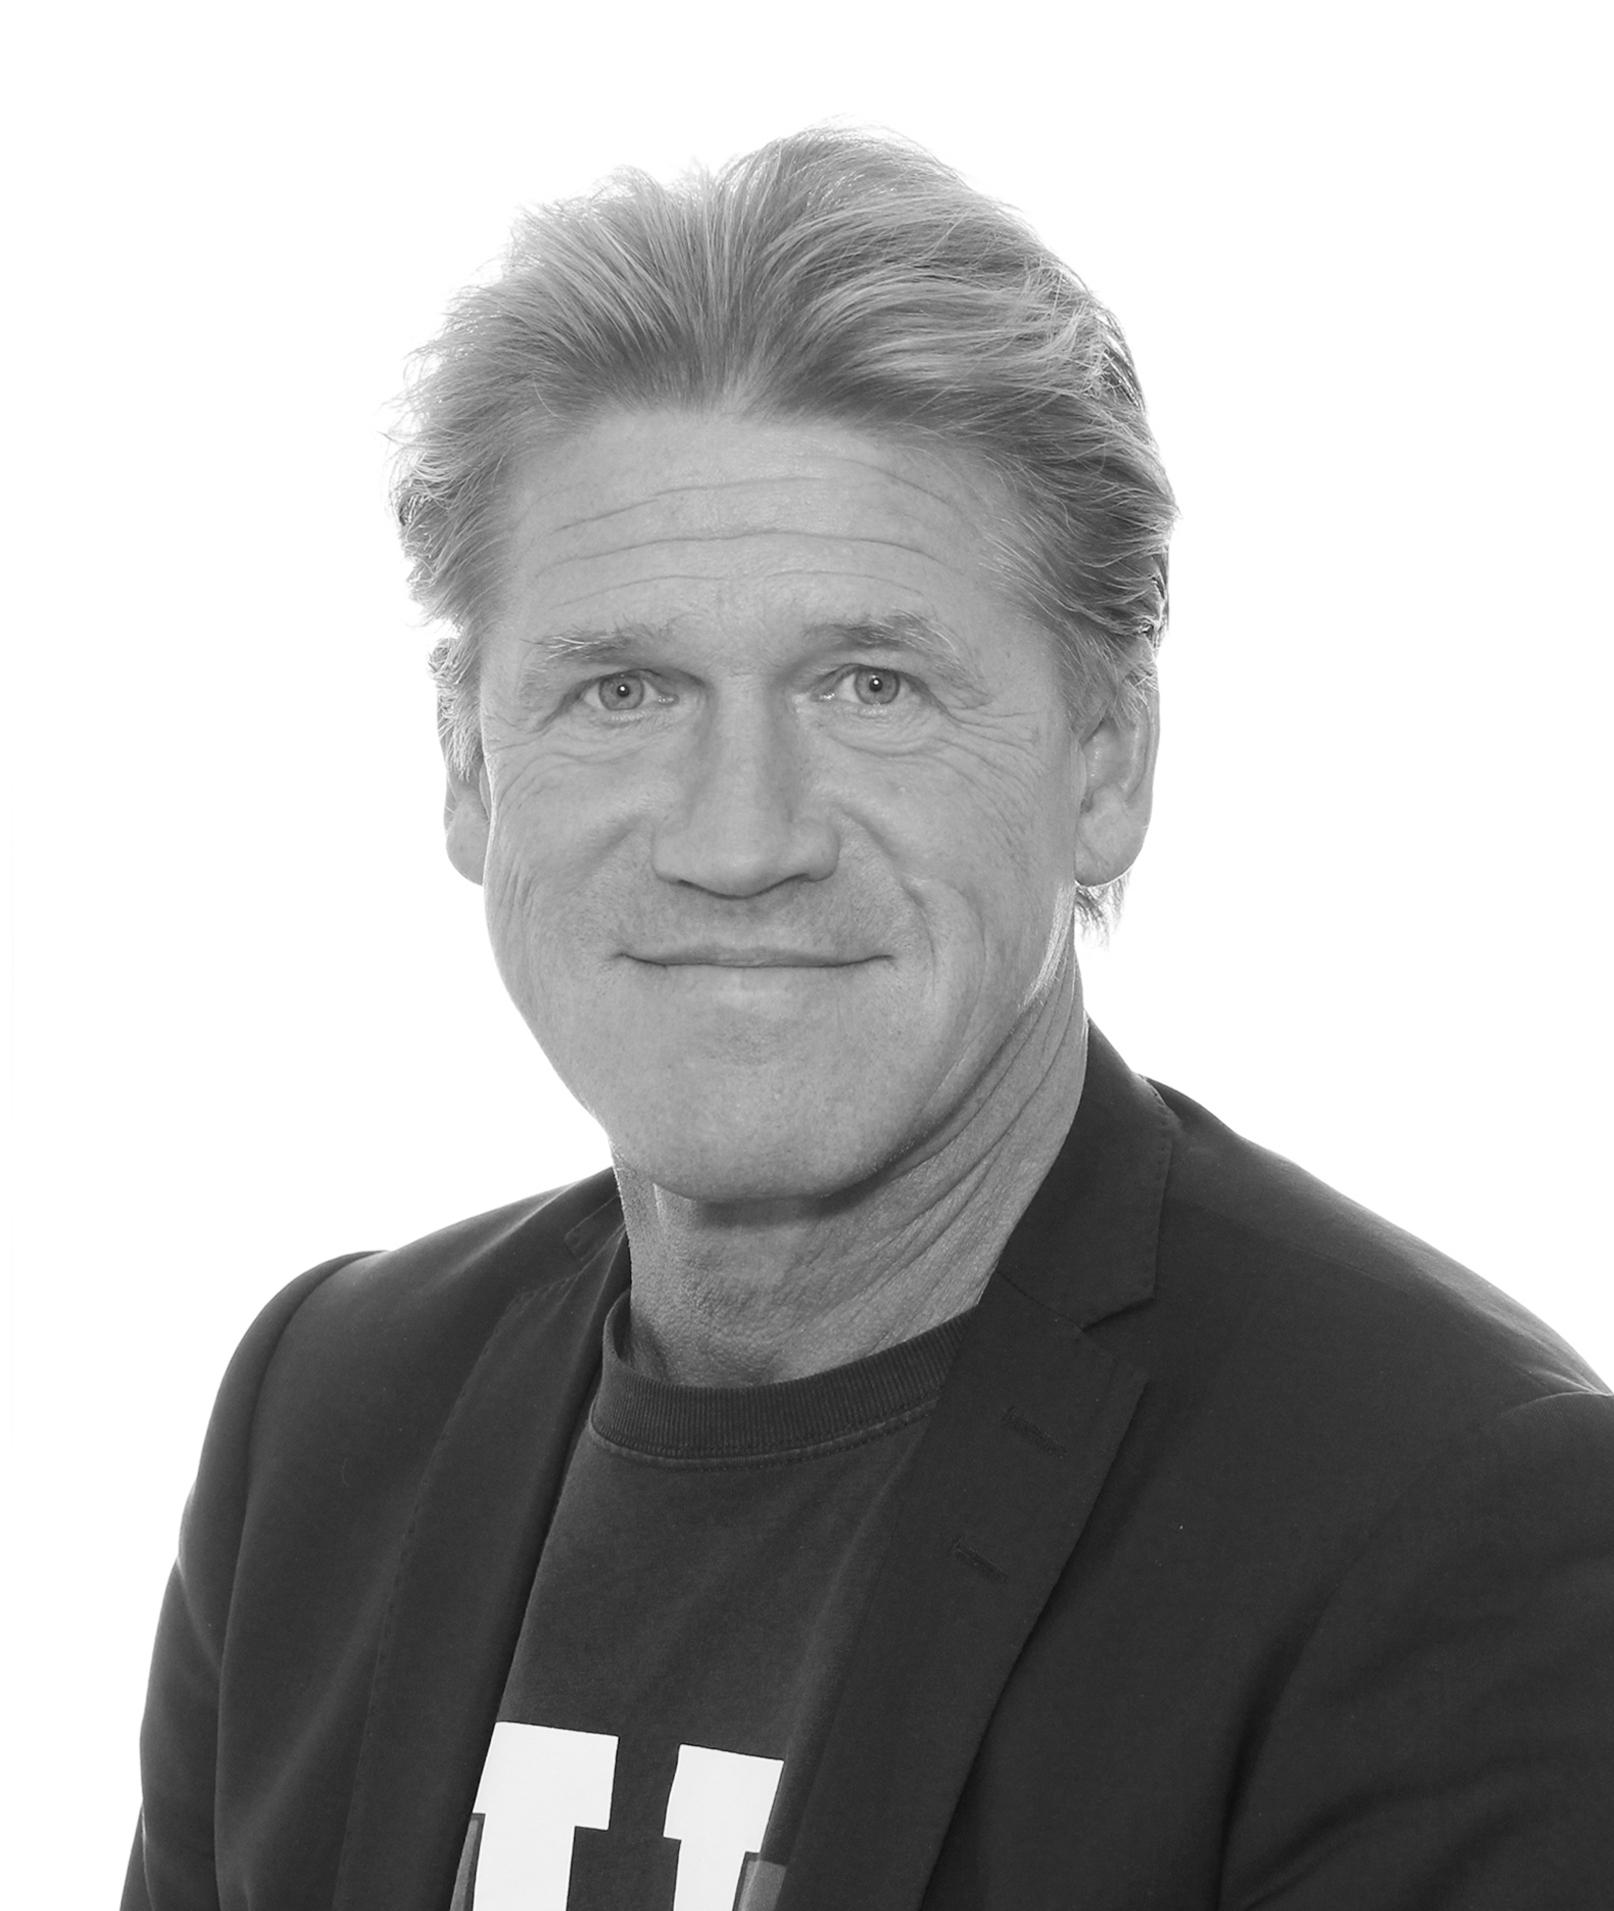 Jens-portræt-Sorthvid